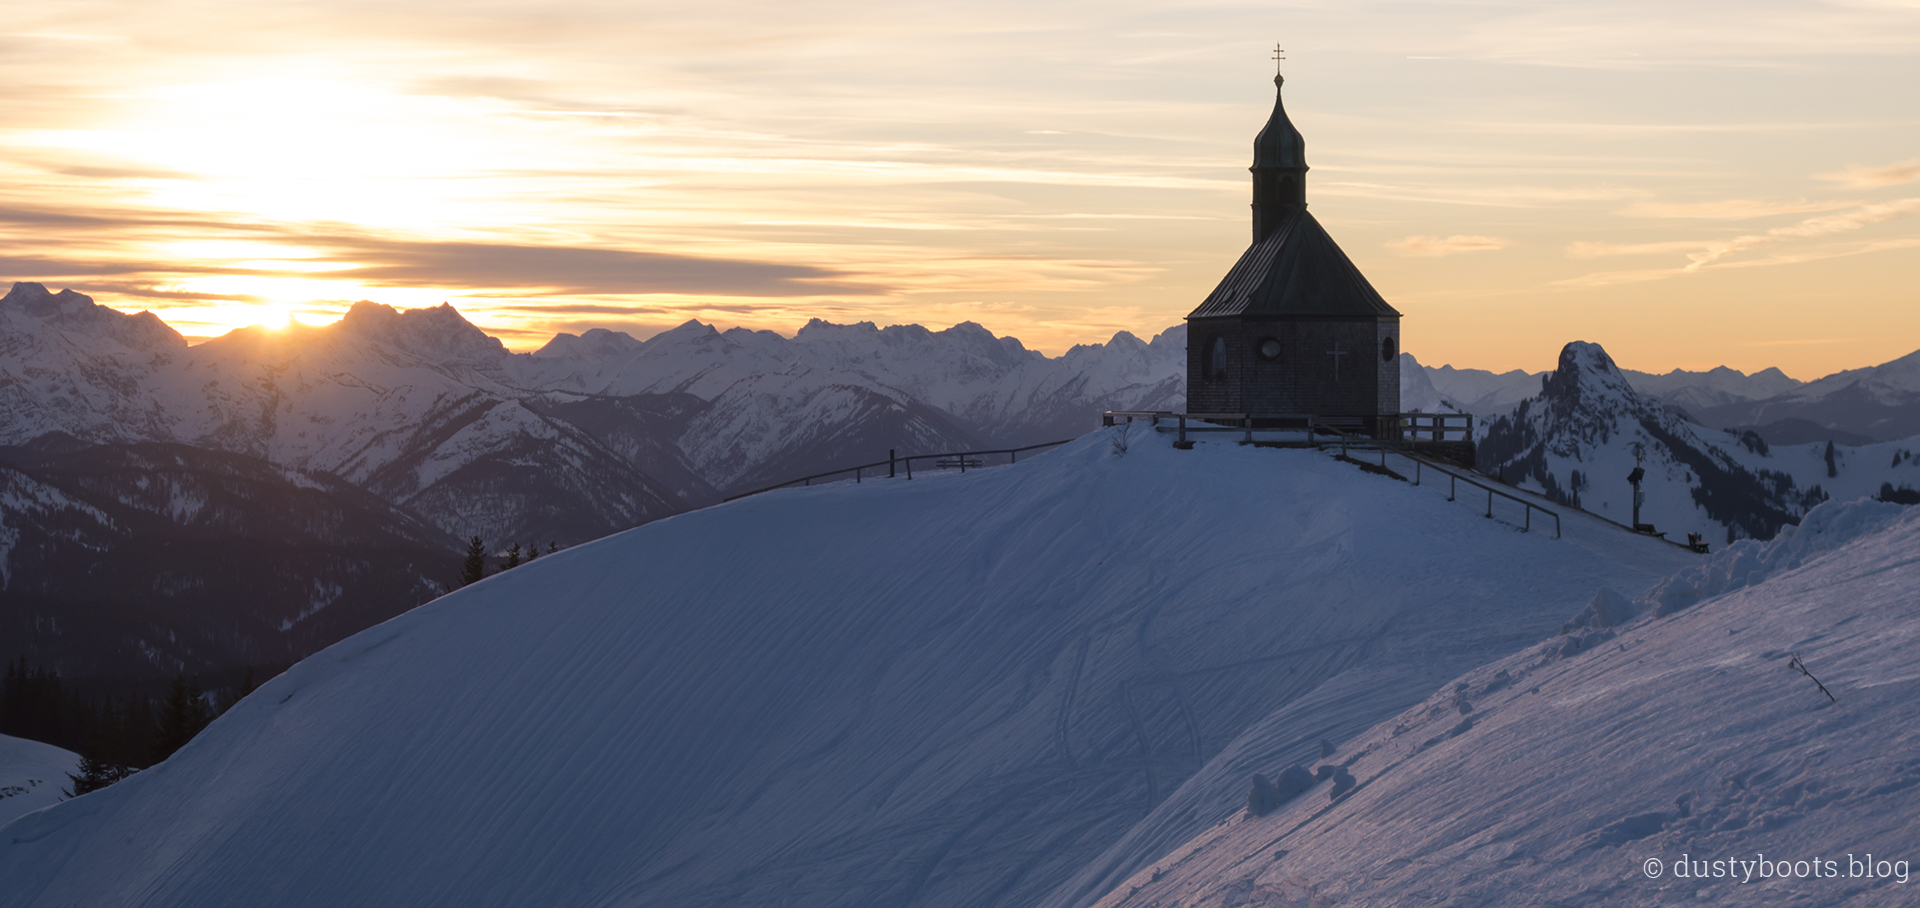 Sonnenuntergang am Wallberg mit Kirche